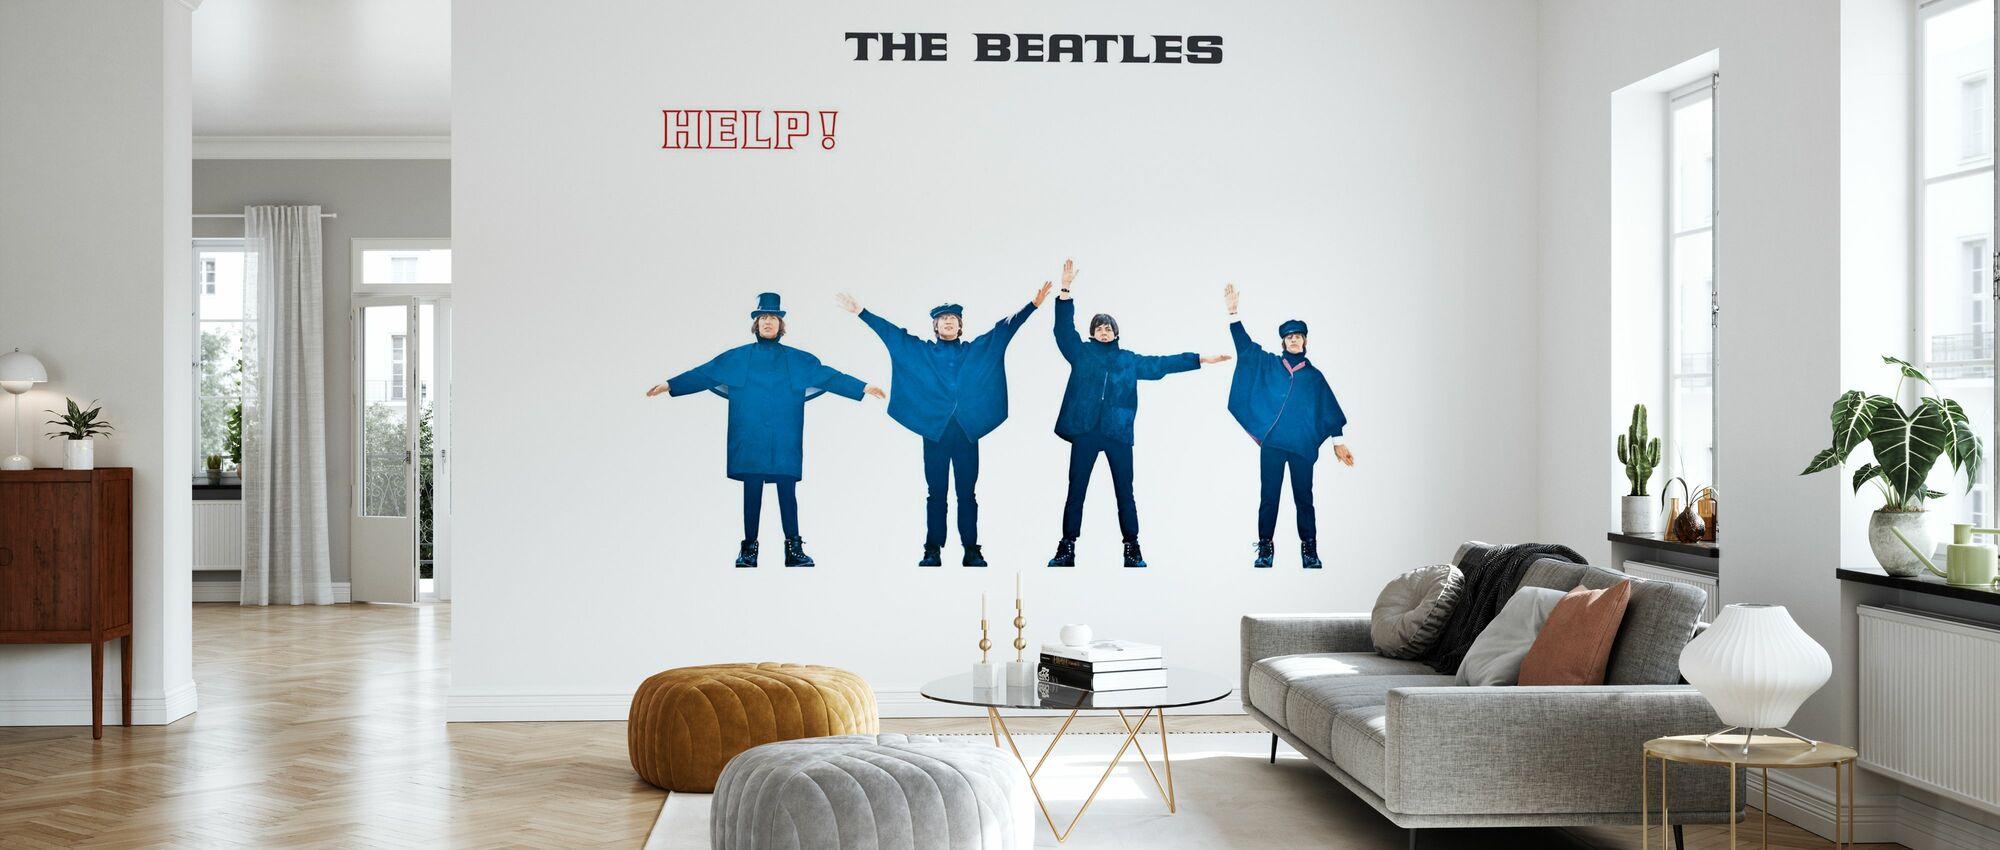 Beatles - Help - Wallpaper - Living Room